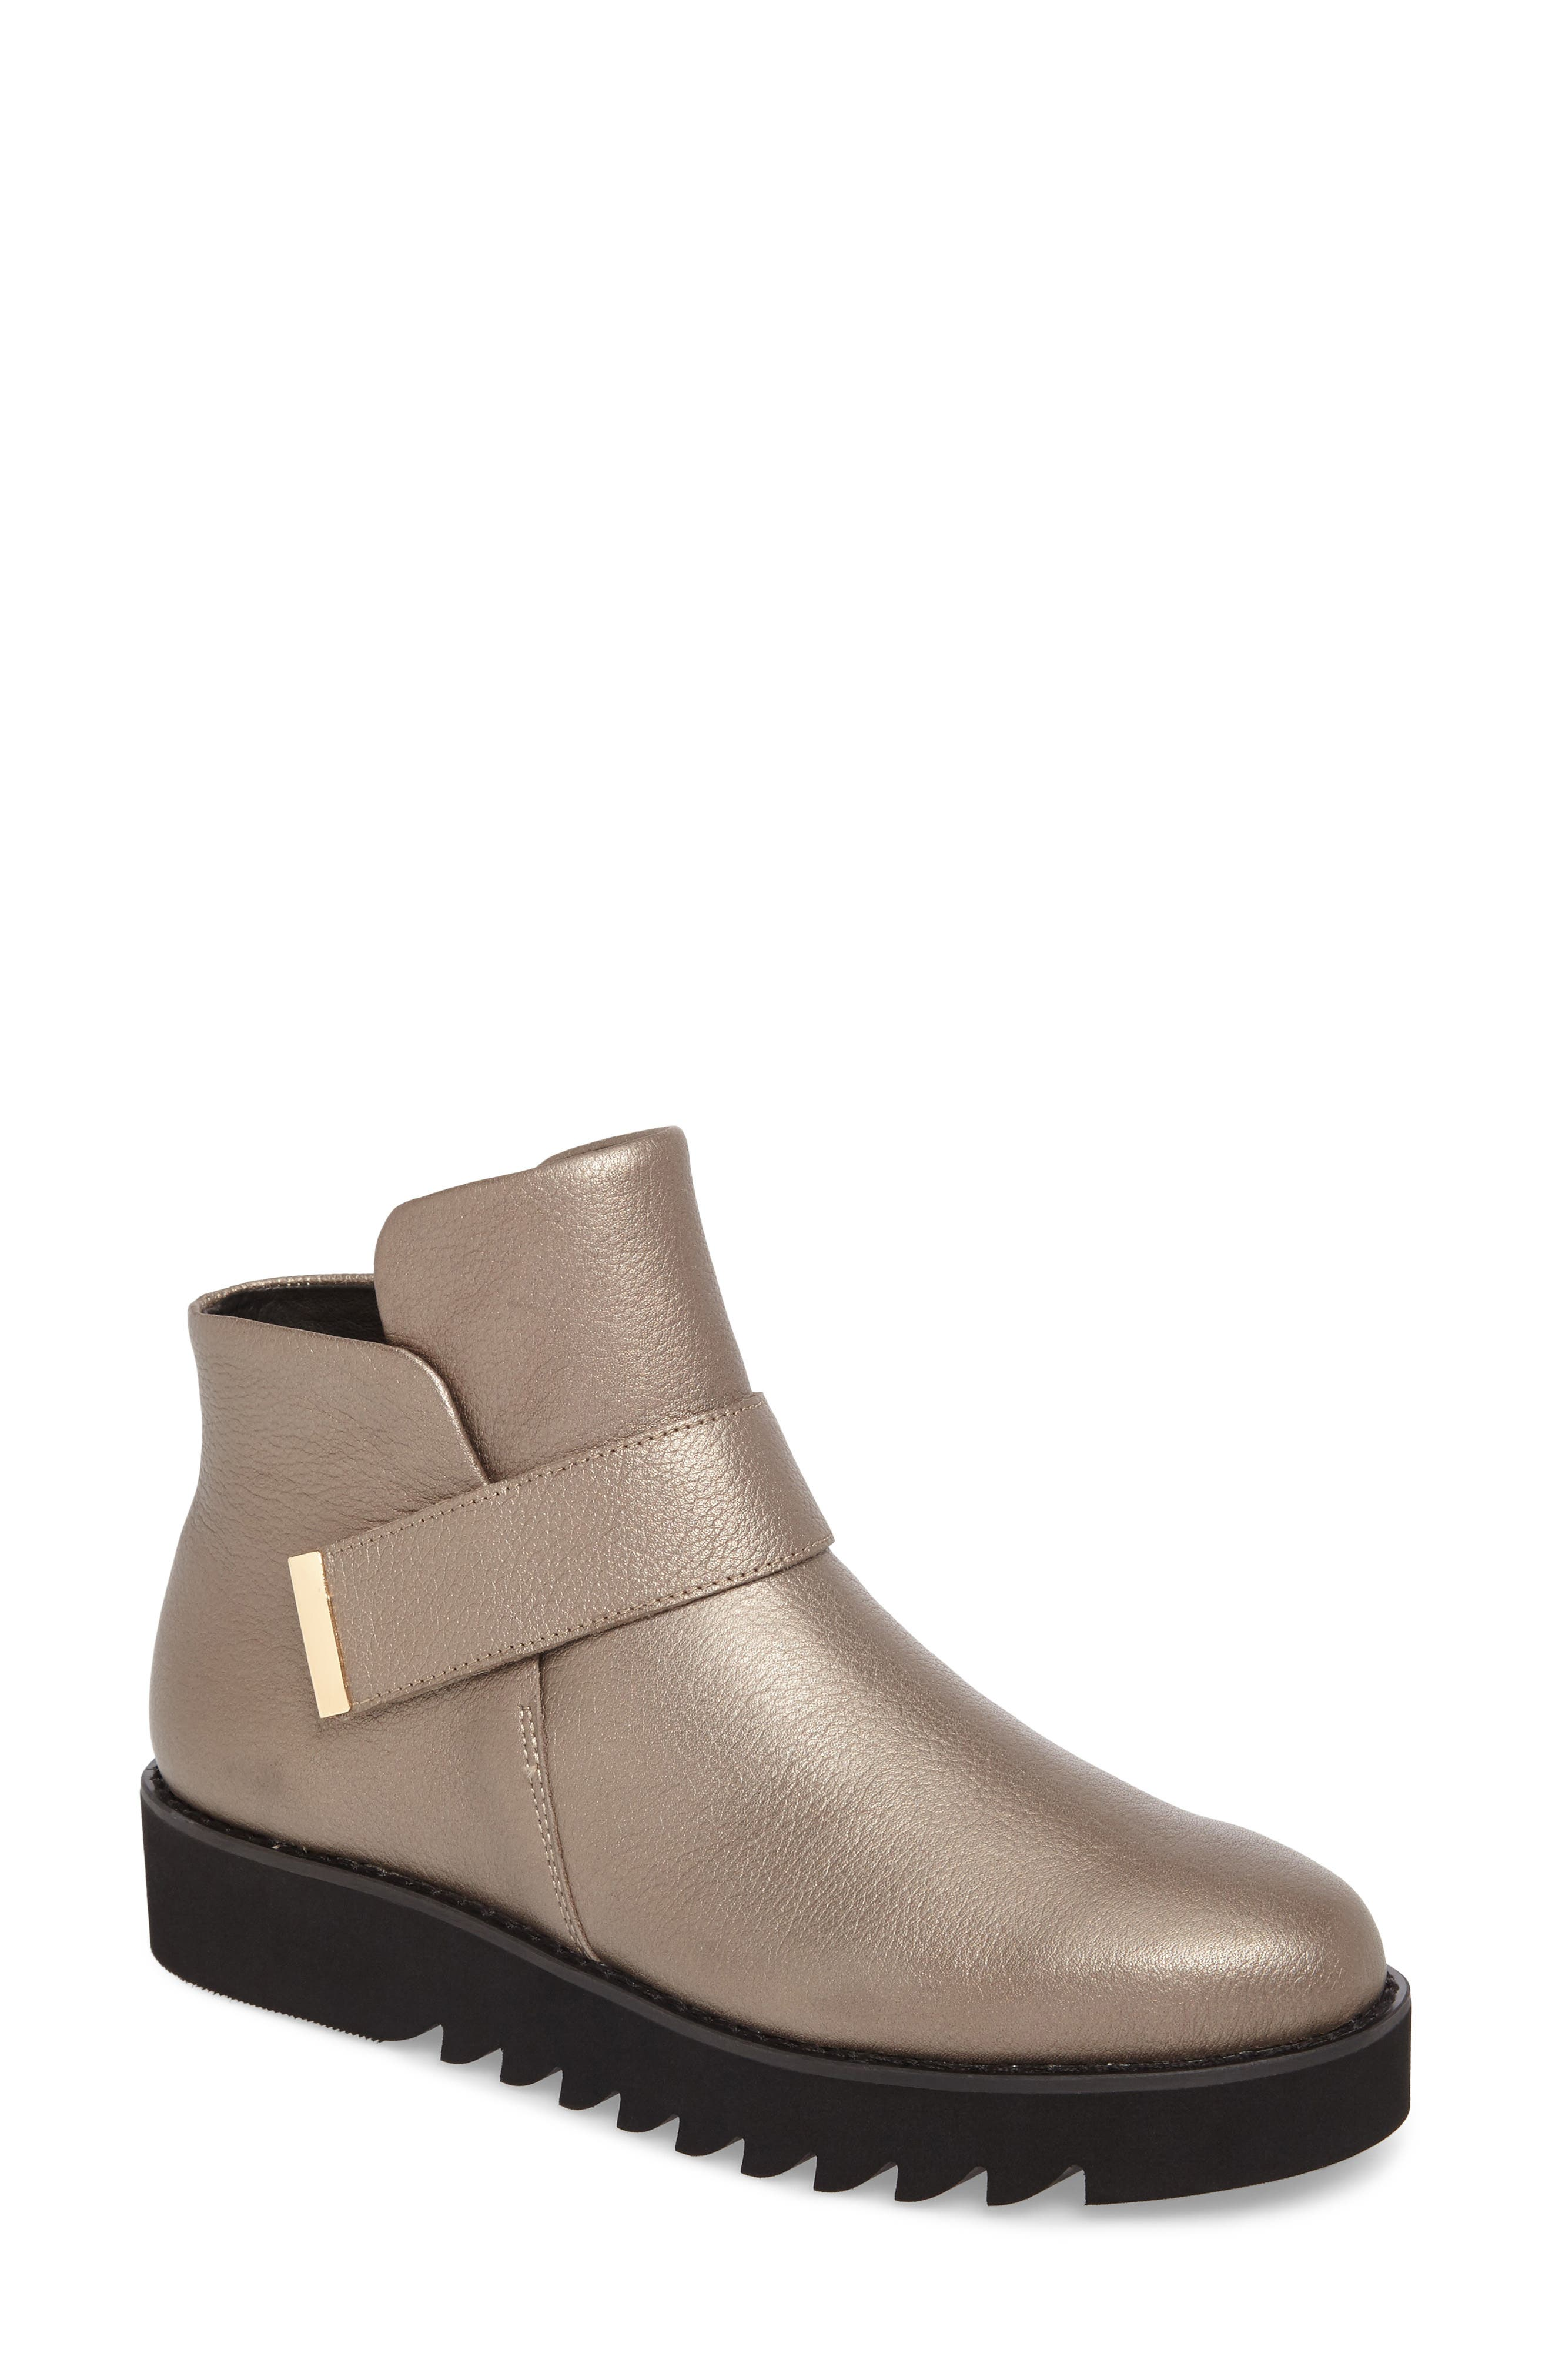 Kris Boot,                             Main thumbnail 1, color,                             Copper Leather